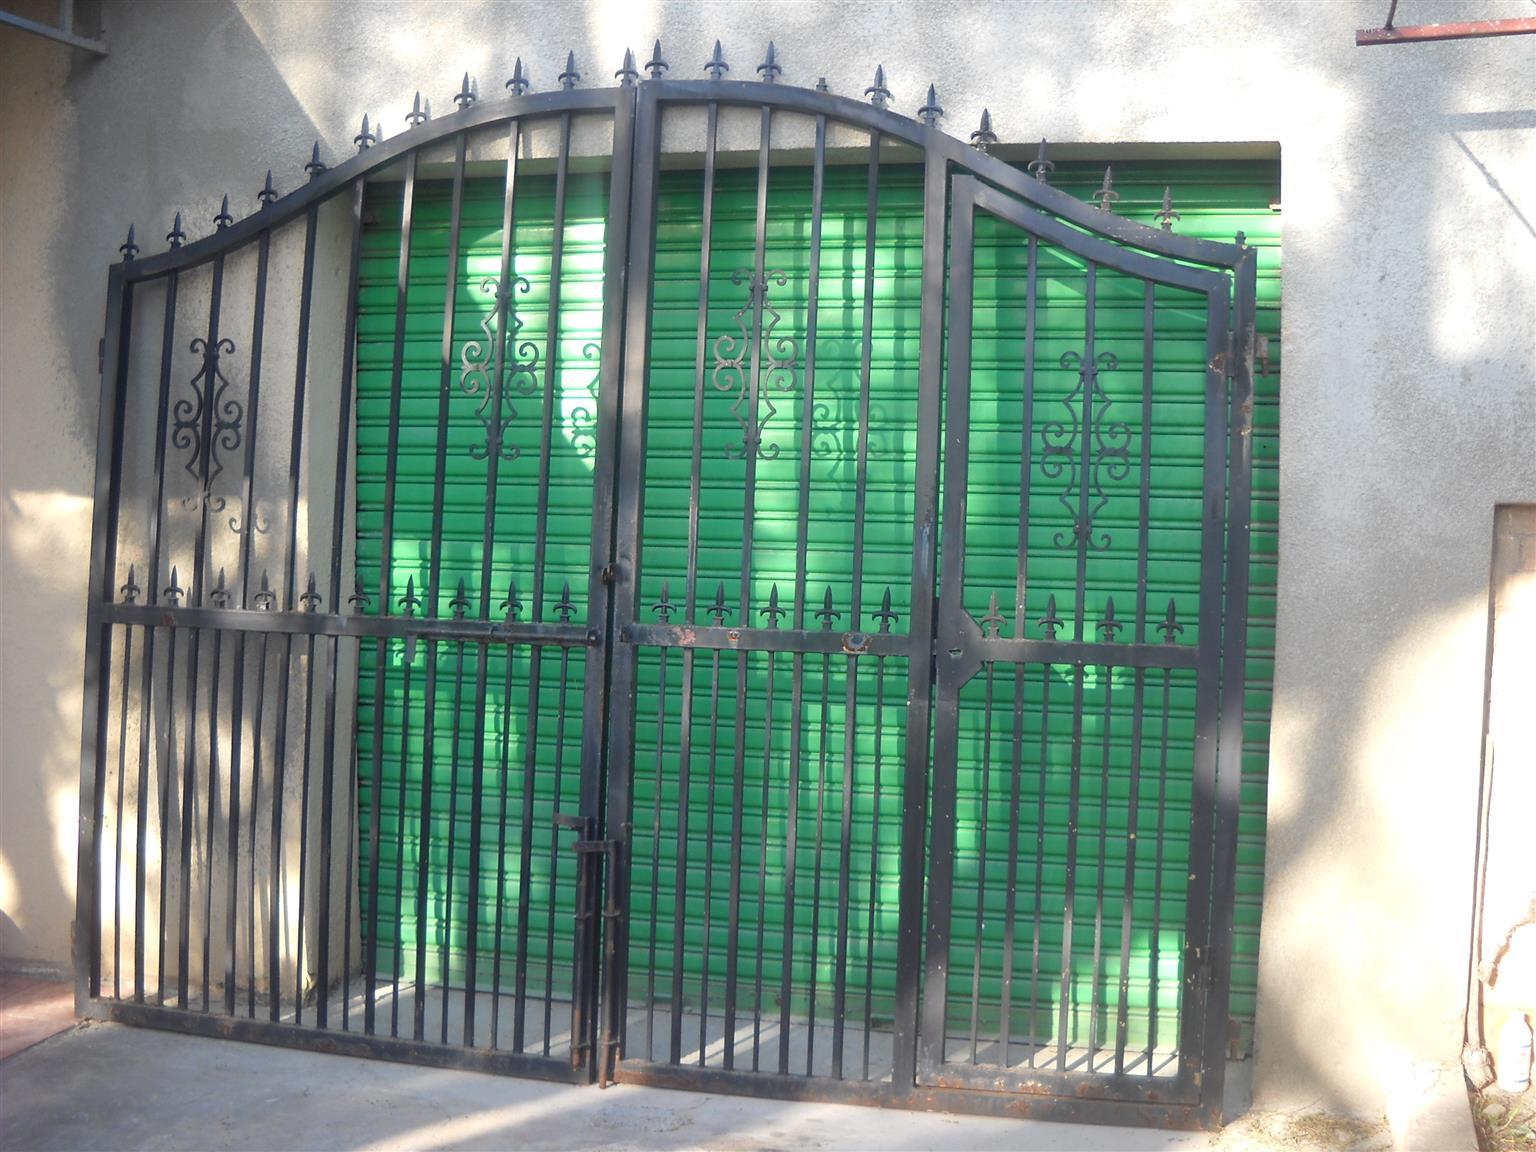 Driveway gates wrought iron (swing type) and single pedestrian gate